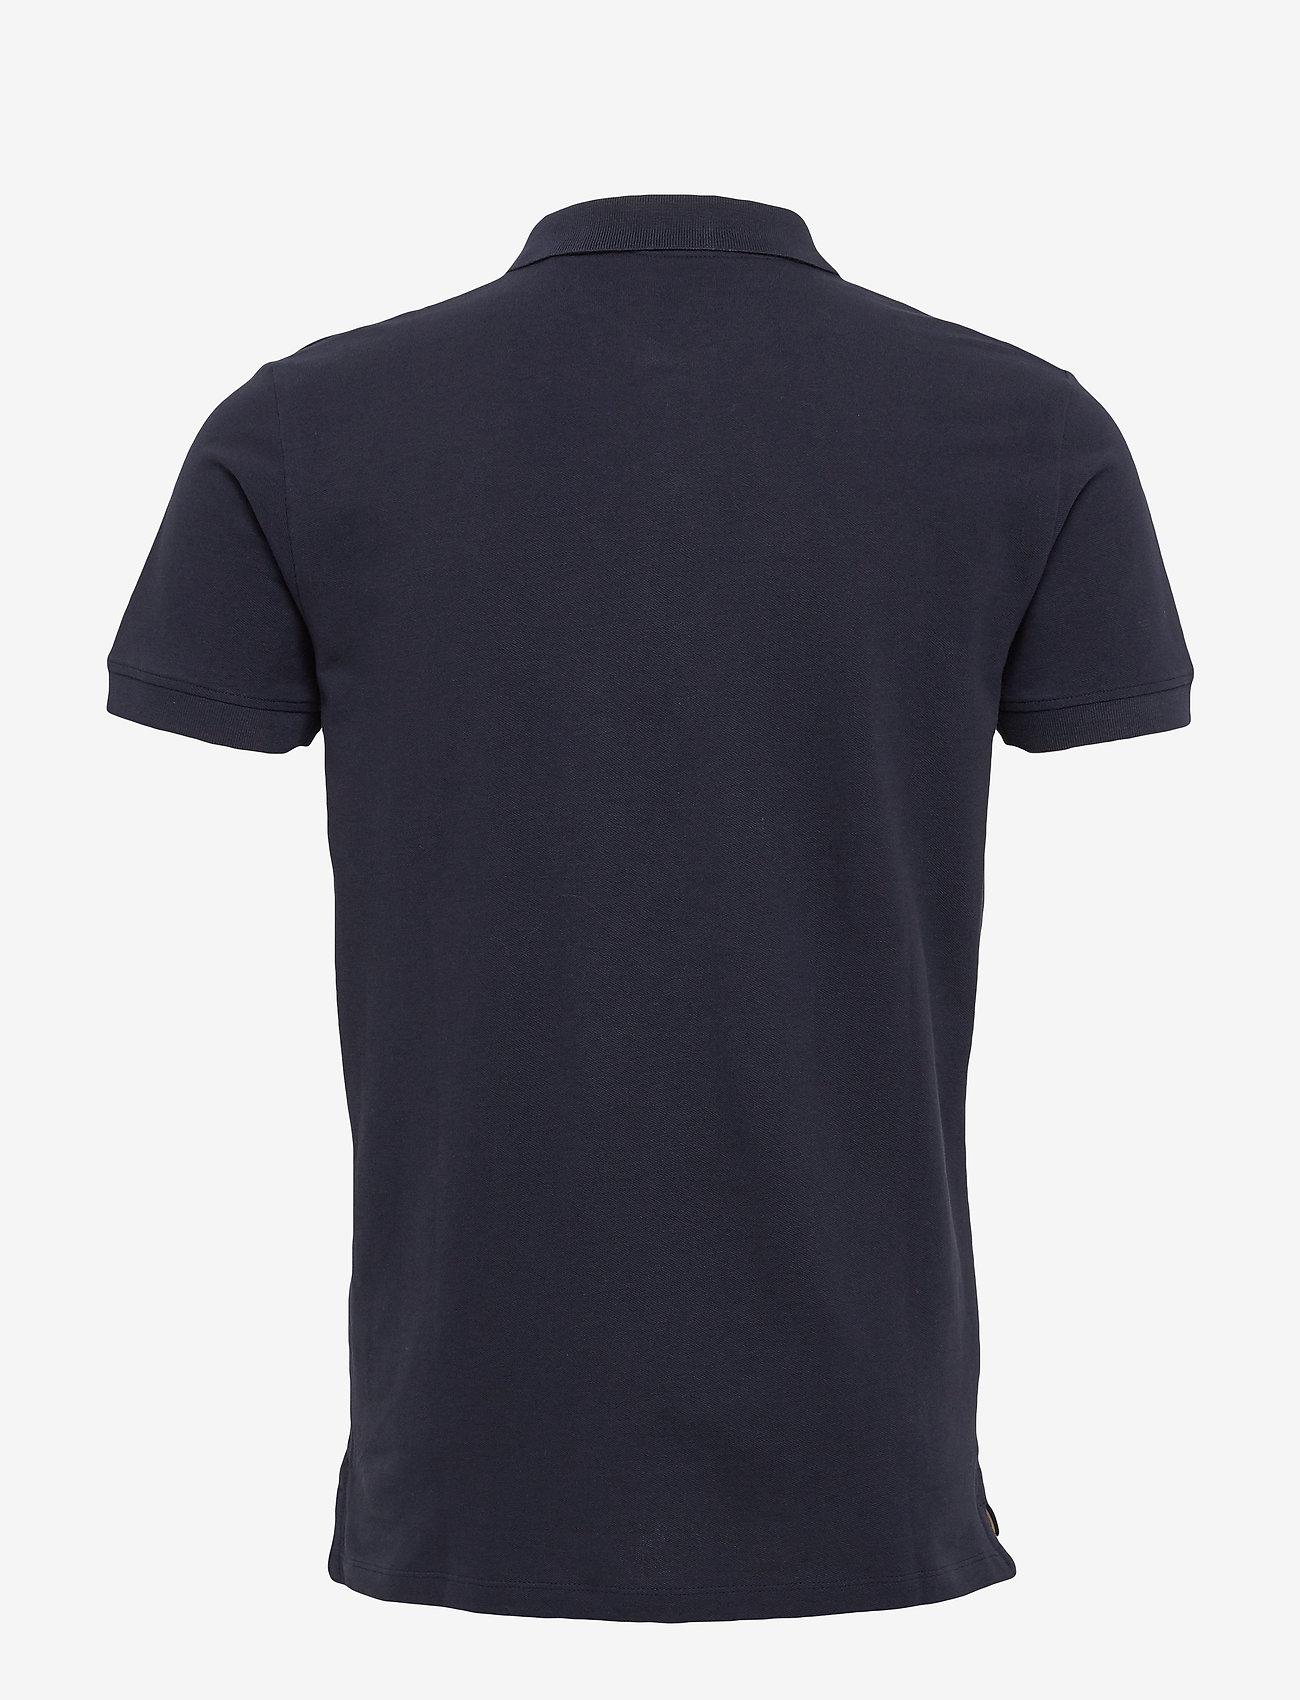 Esprit Casual - Polo shirts - short-sleeved polos - navy - 1